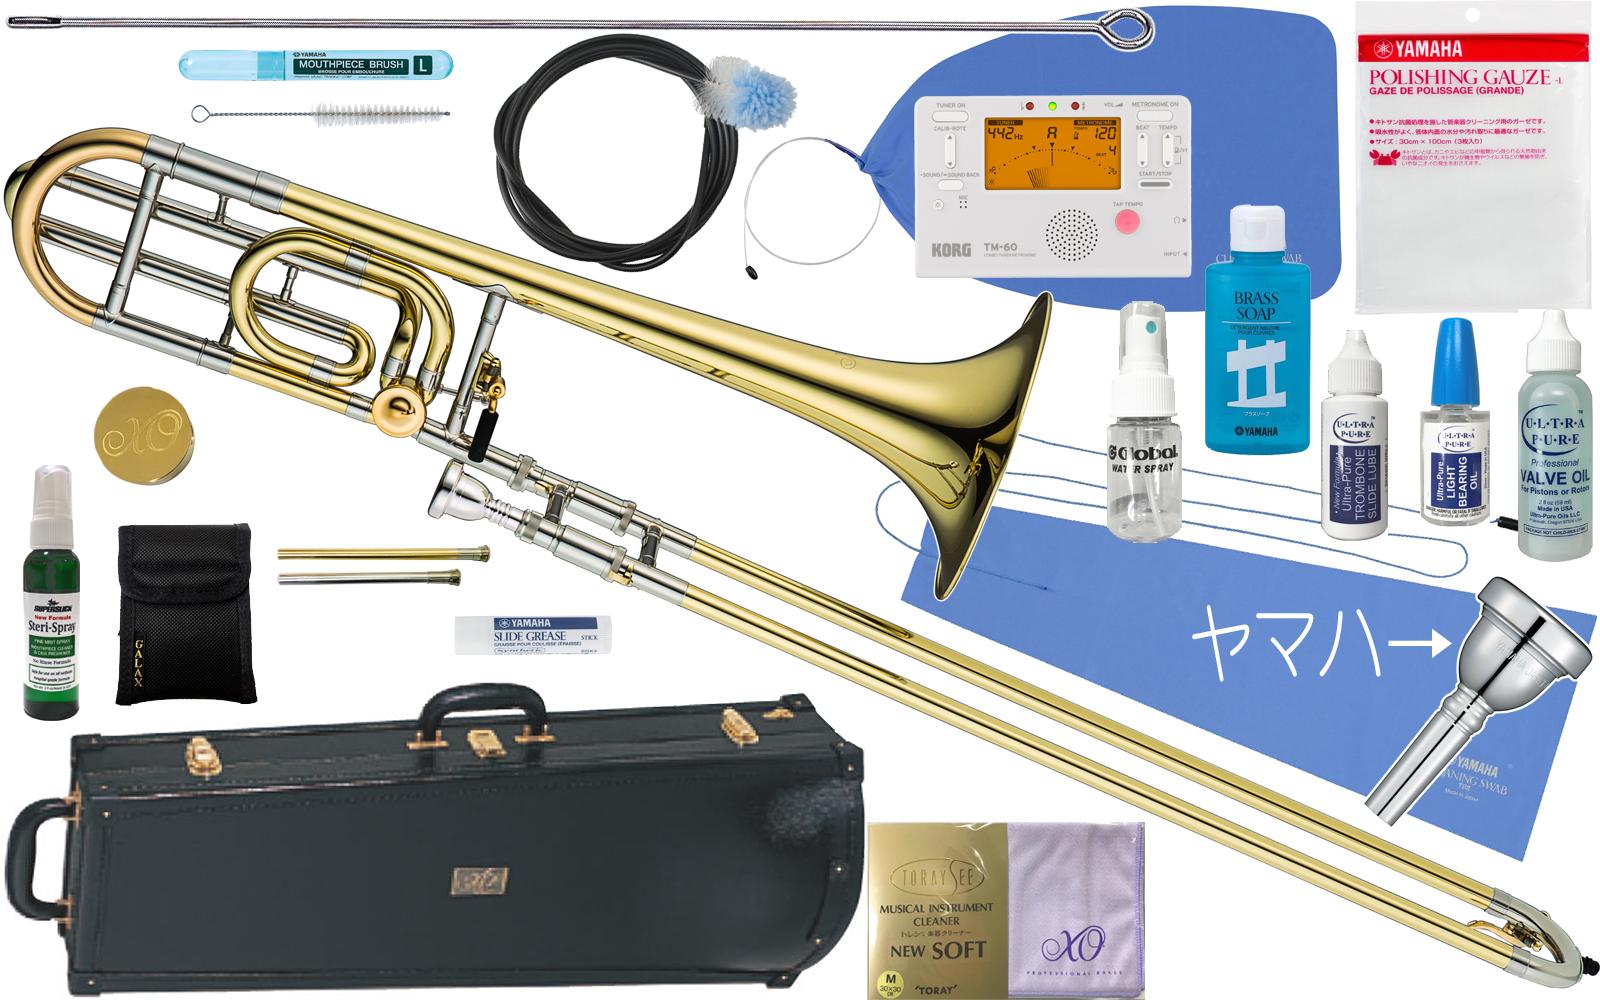 XO ( エックスオー ) 1236L トロンボーン 新品 B♭/F管 テナーバストロンボーン イエローブラス 太管 ロータリーバルブ 管楽器 本体 Tenor Bass Trombones SR-L セットA 送料無料